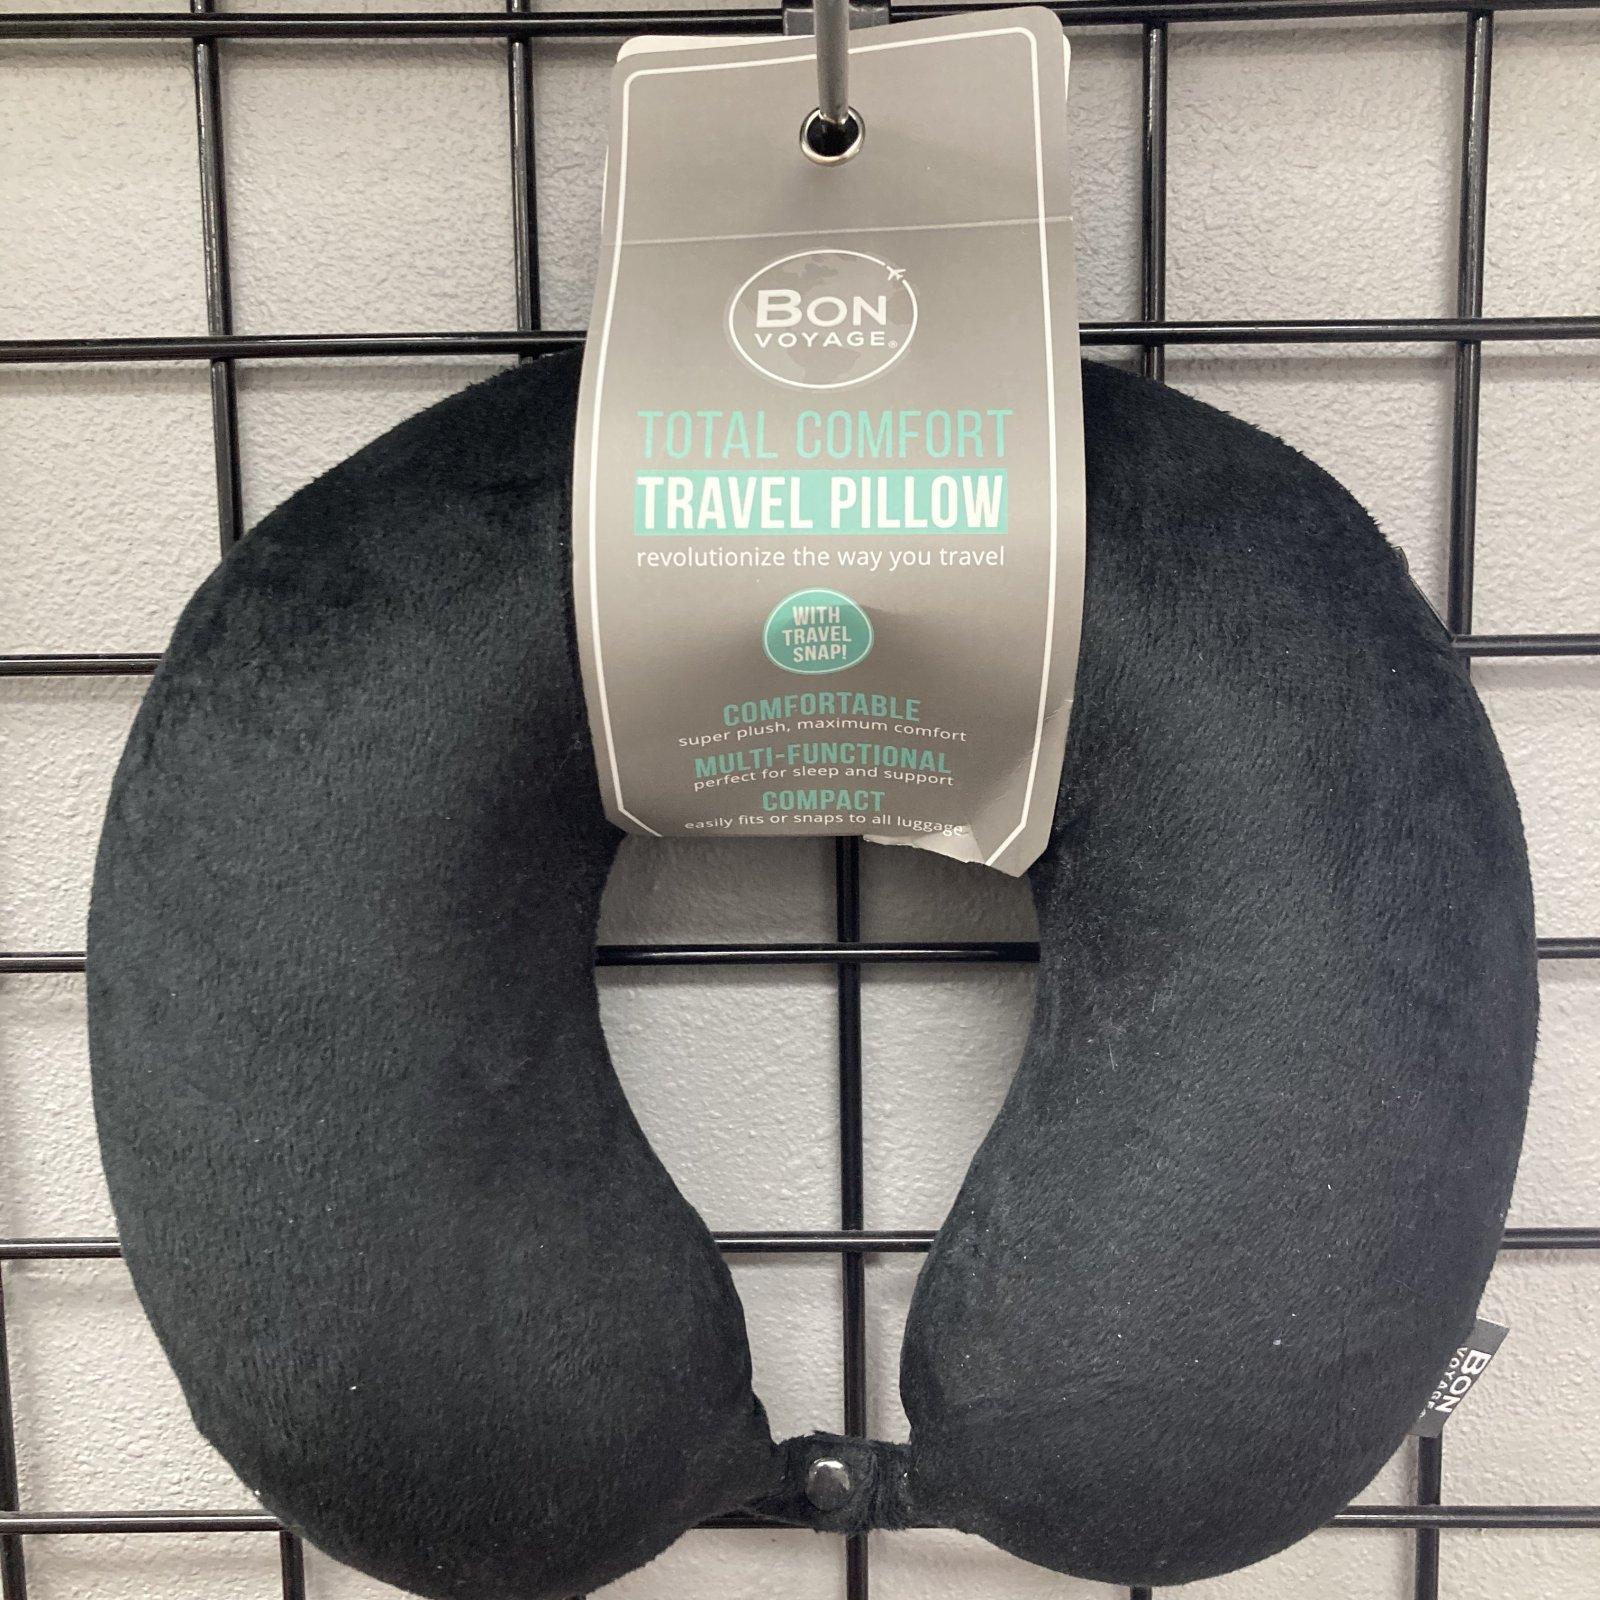 Blank Neck Pillow - Total Comfort Travel Pillow